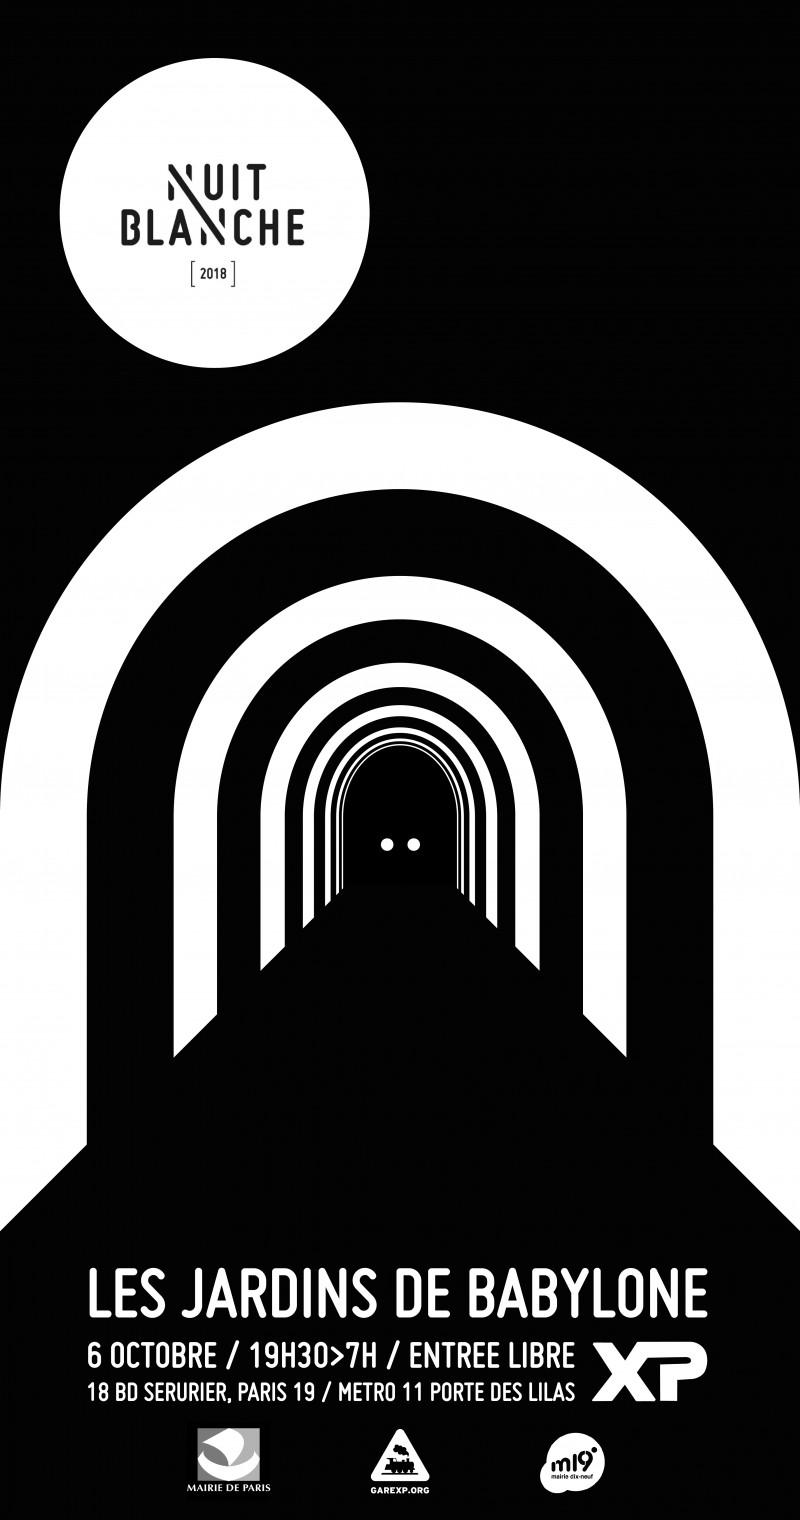 affiche-nuit-blanche-2018-gare-xp-51e75ad960d97b95eee226a508ce408b